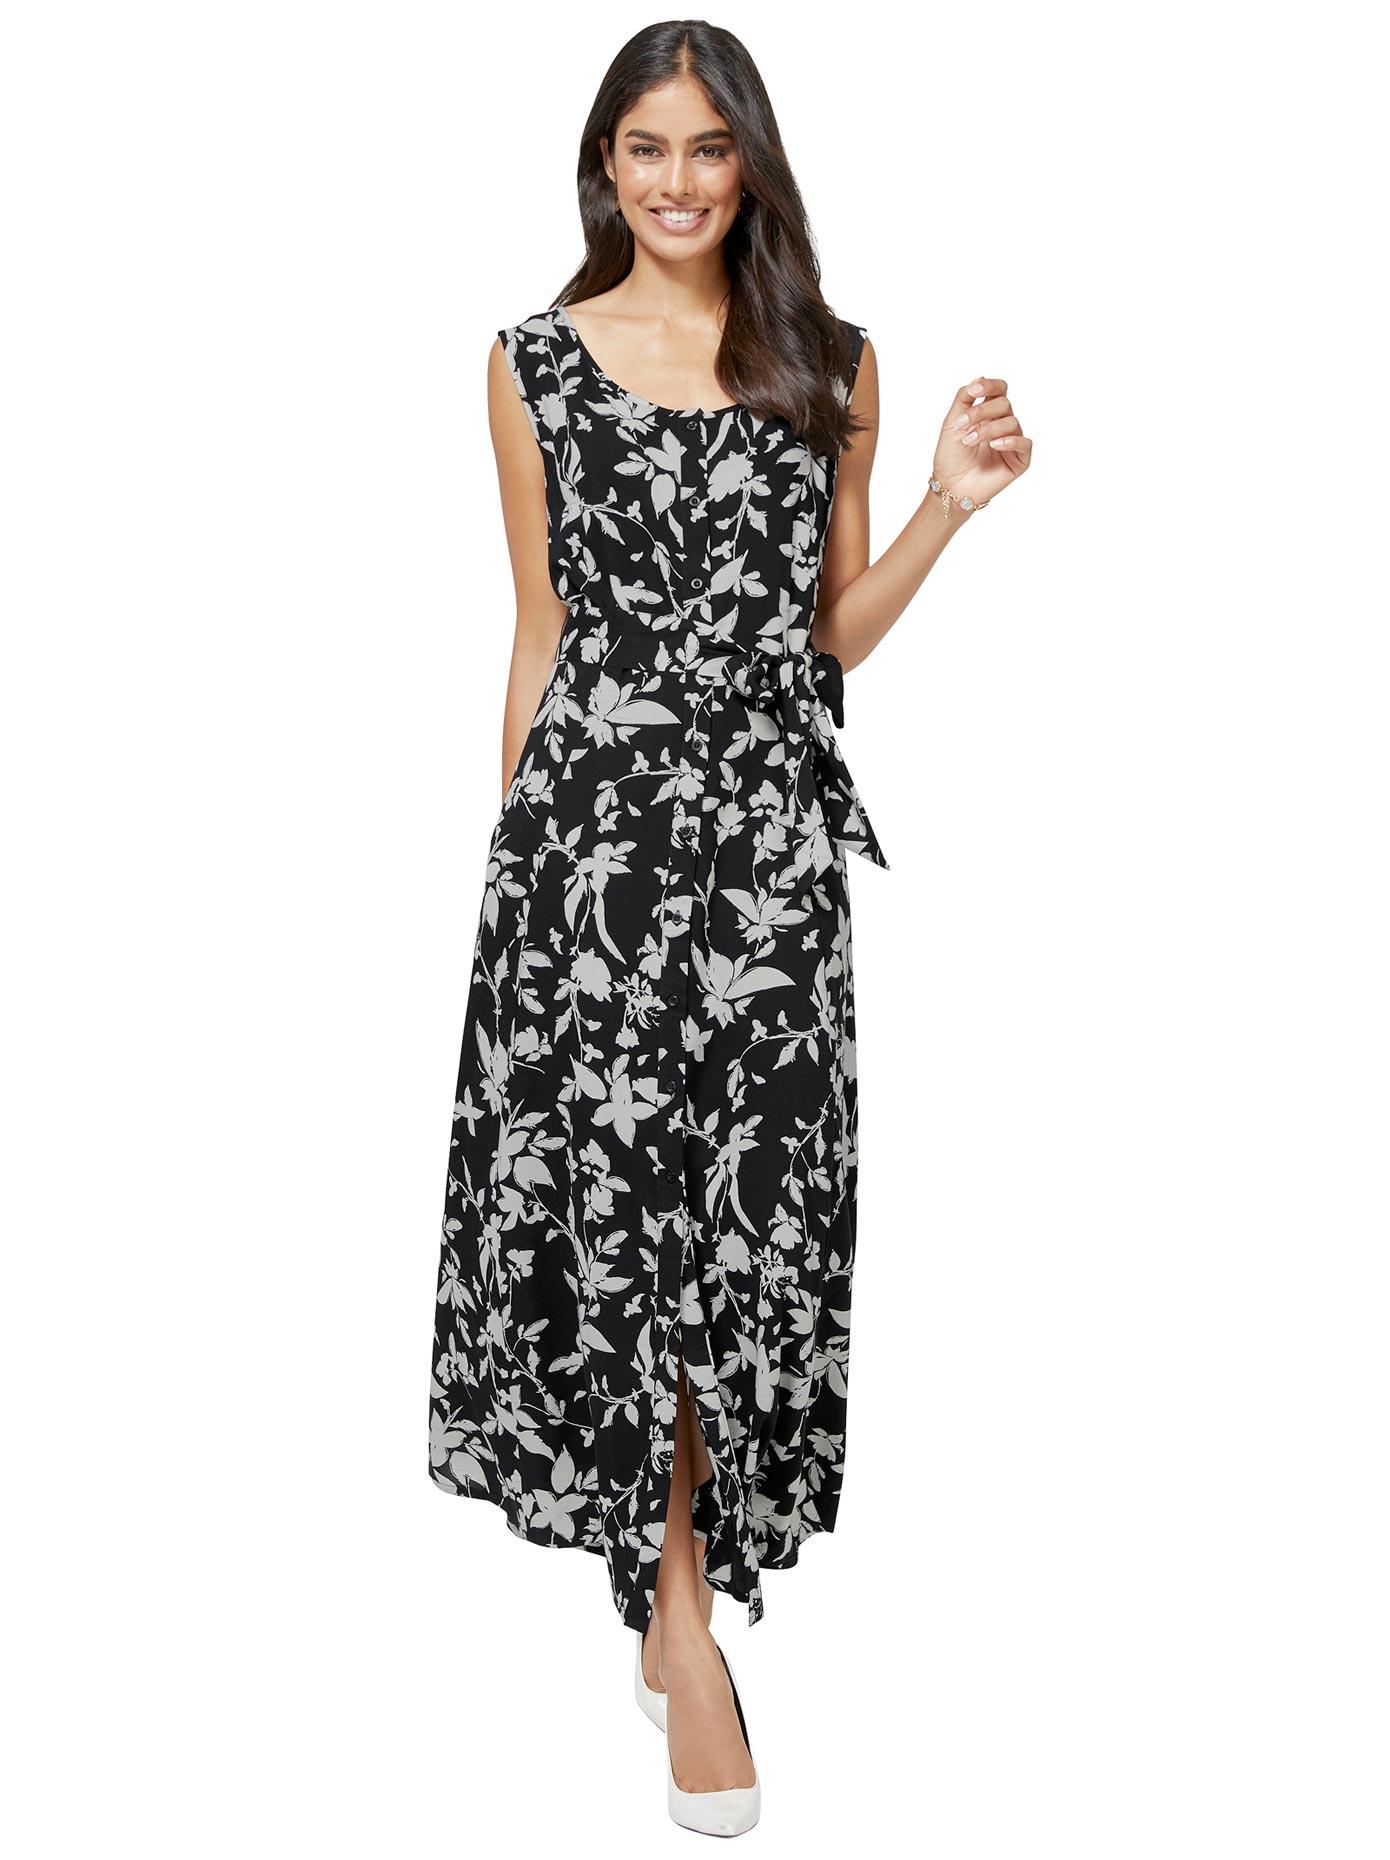 Image of Alessa W. Collection Kleid mit floralem Kontrast-Druck